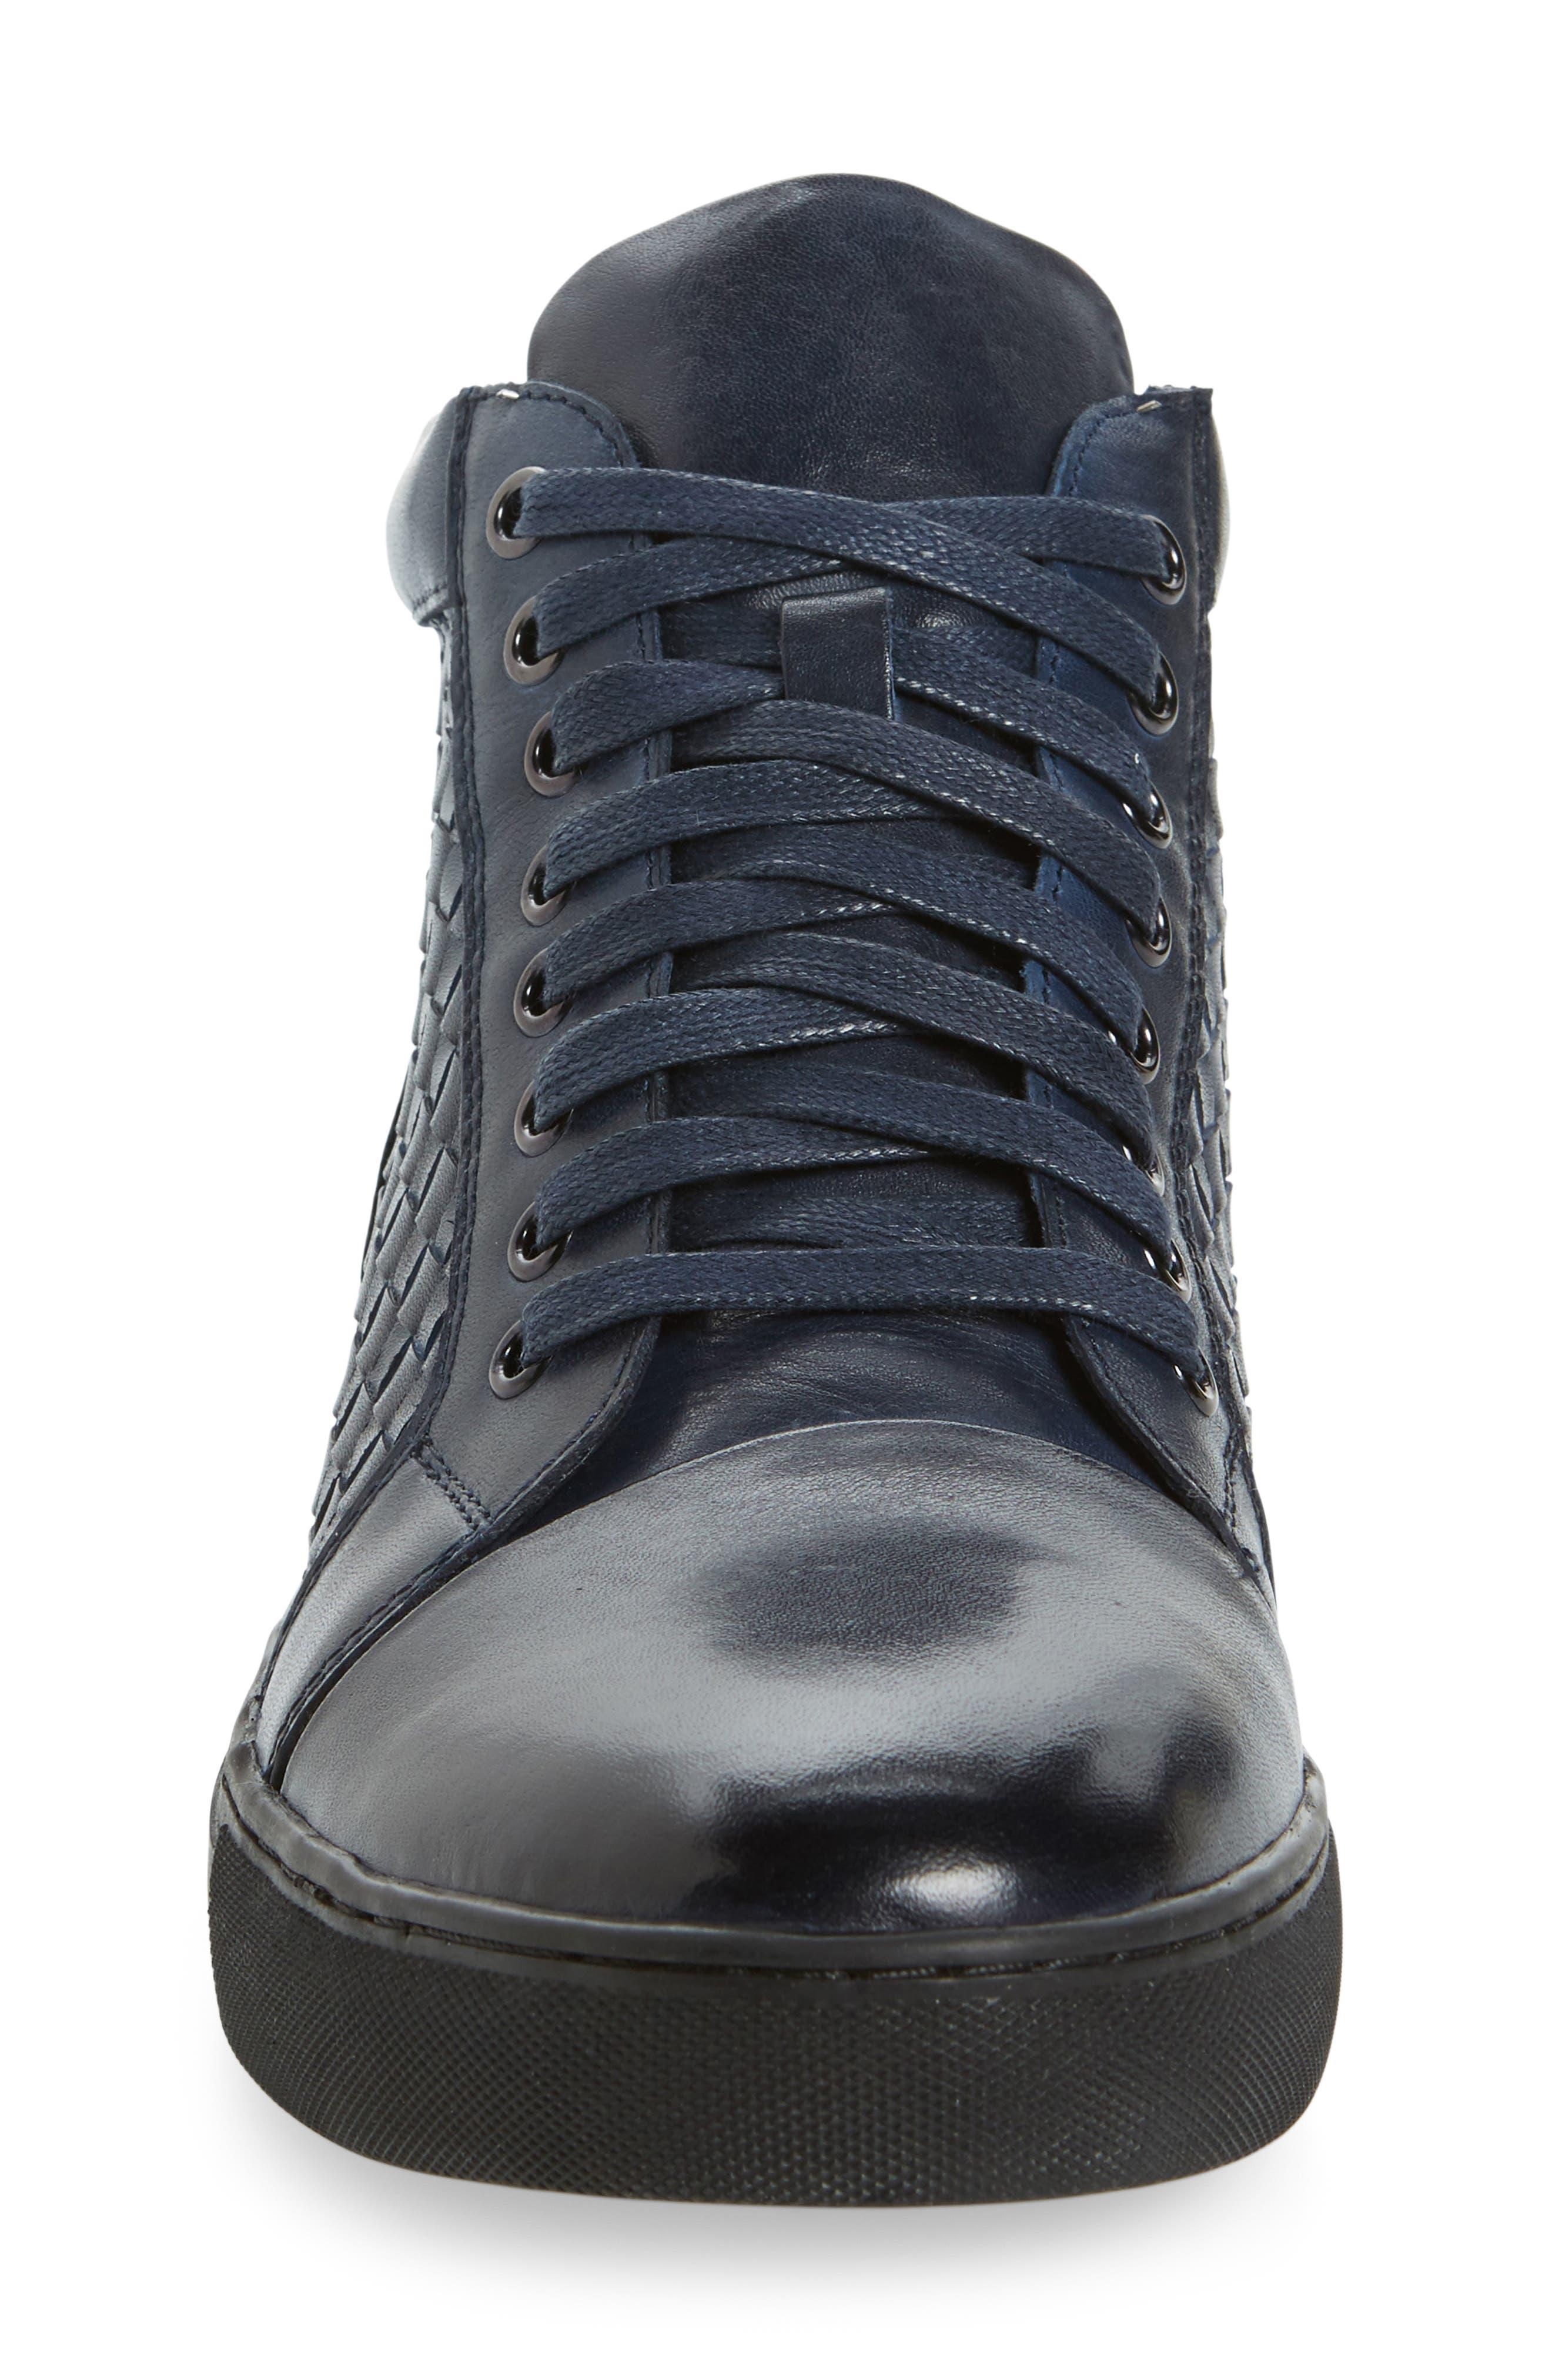 Alternate Image 3  - Zanzara Soul High Top Sneaker (Men)